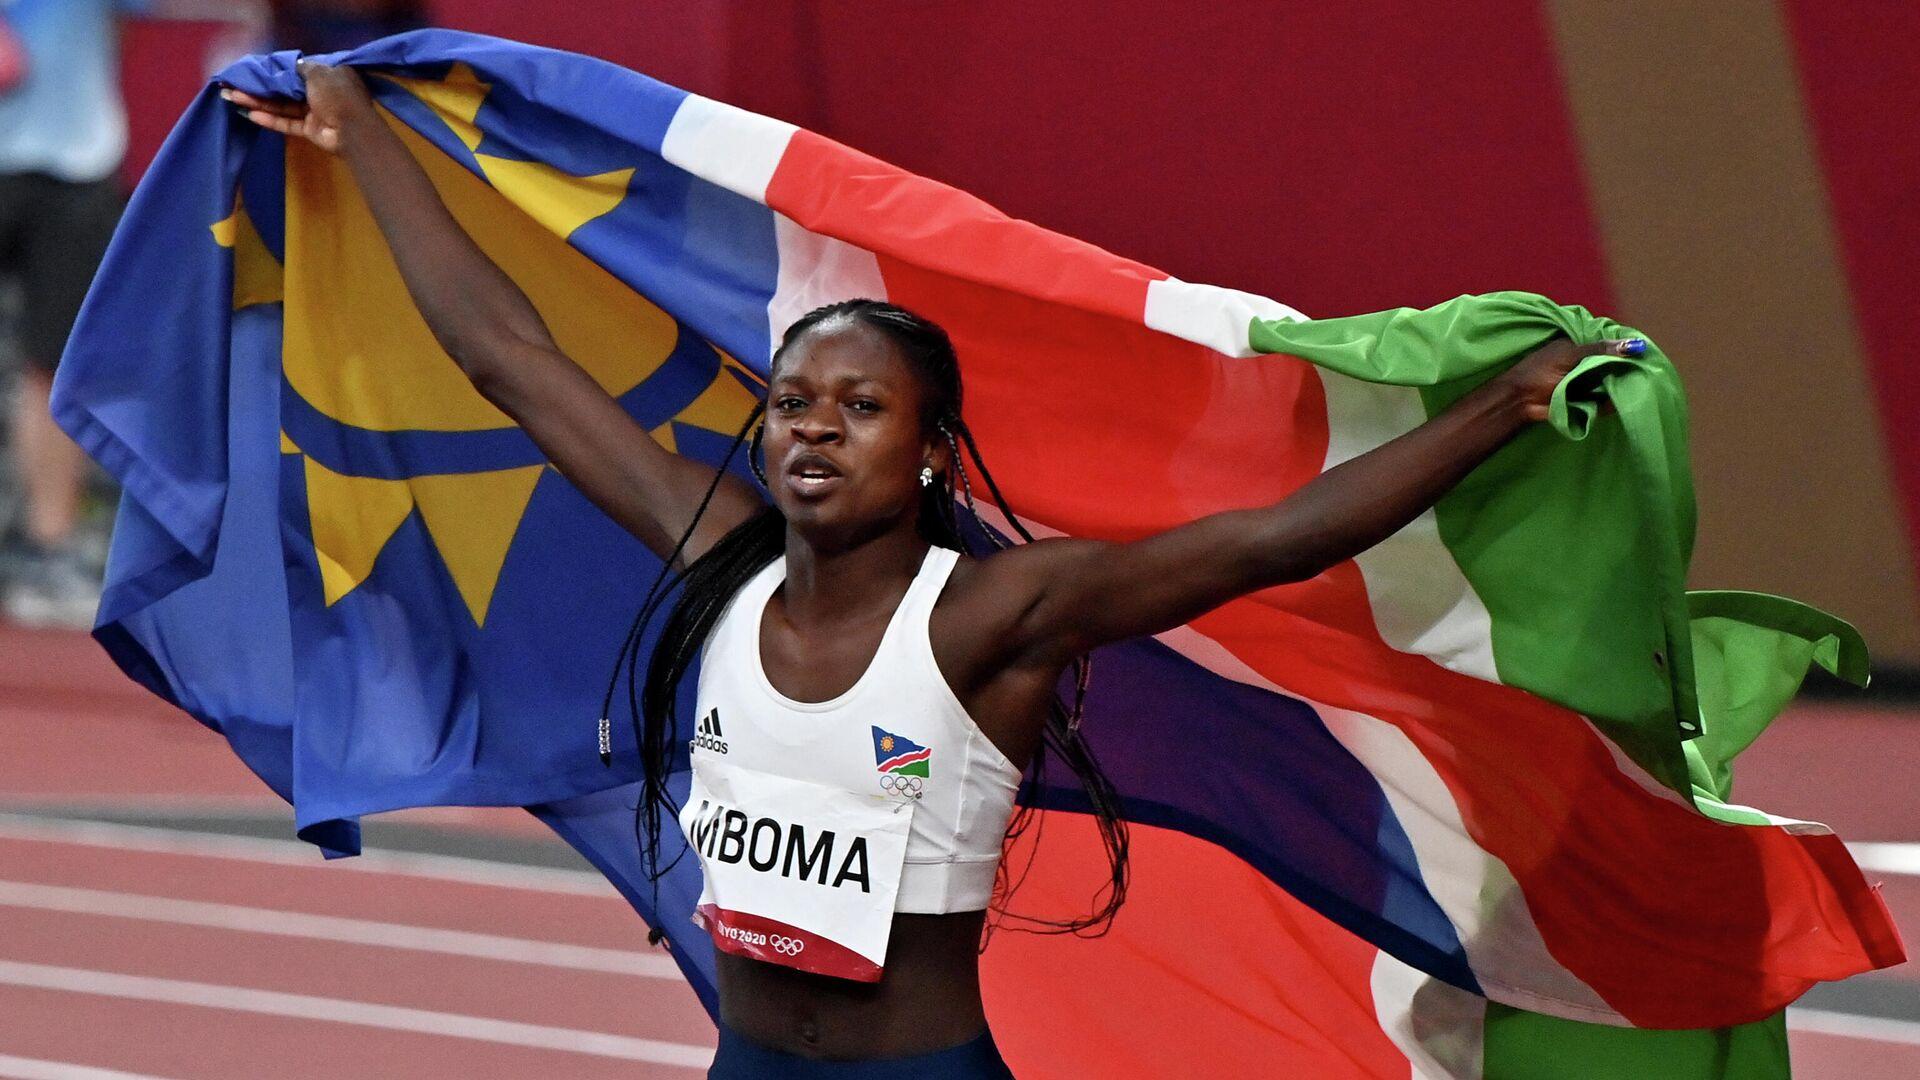 18-летняя спортсменка из Намибии Кристин Мбома - РИА Новости, 1920, 04.08.2021